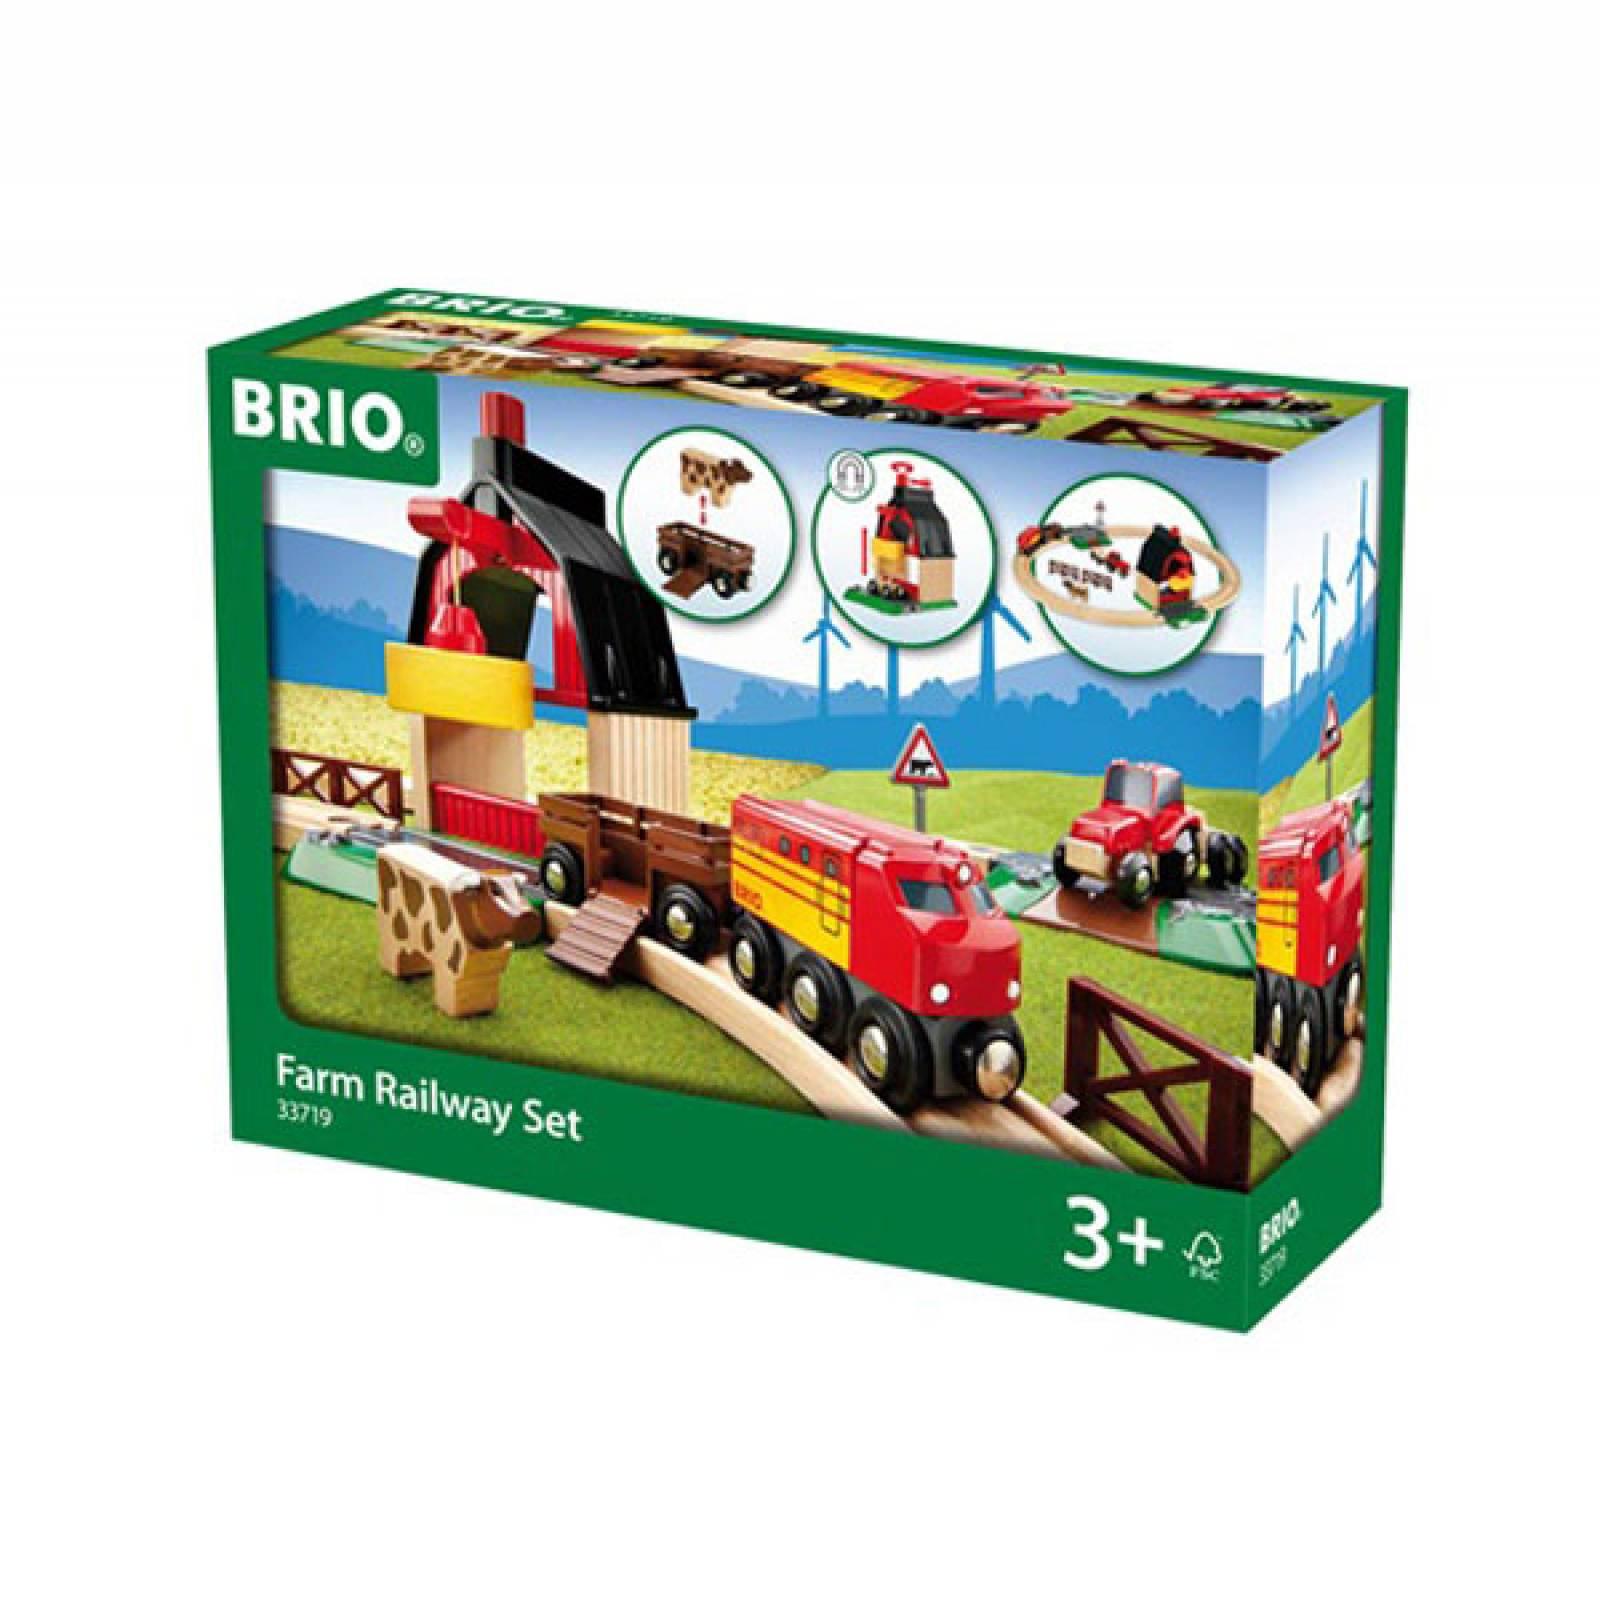 Farm Railway Set BRIO Wooden Railway 3+